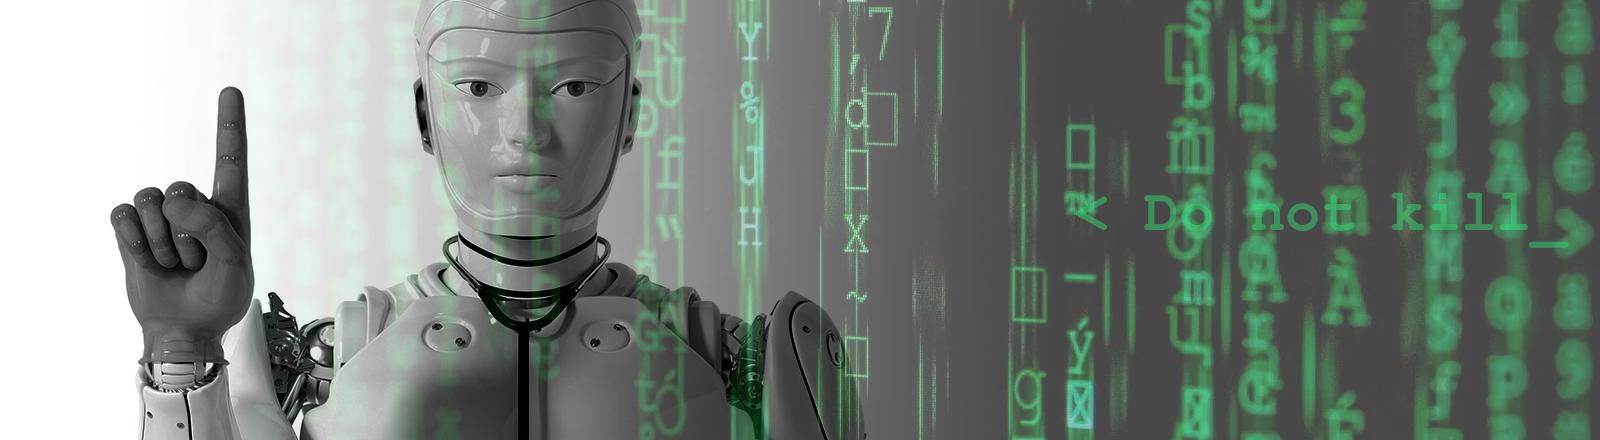 Roboter mit erhobenem Zeigefinger